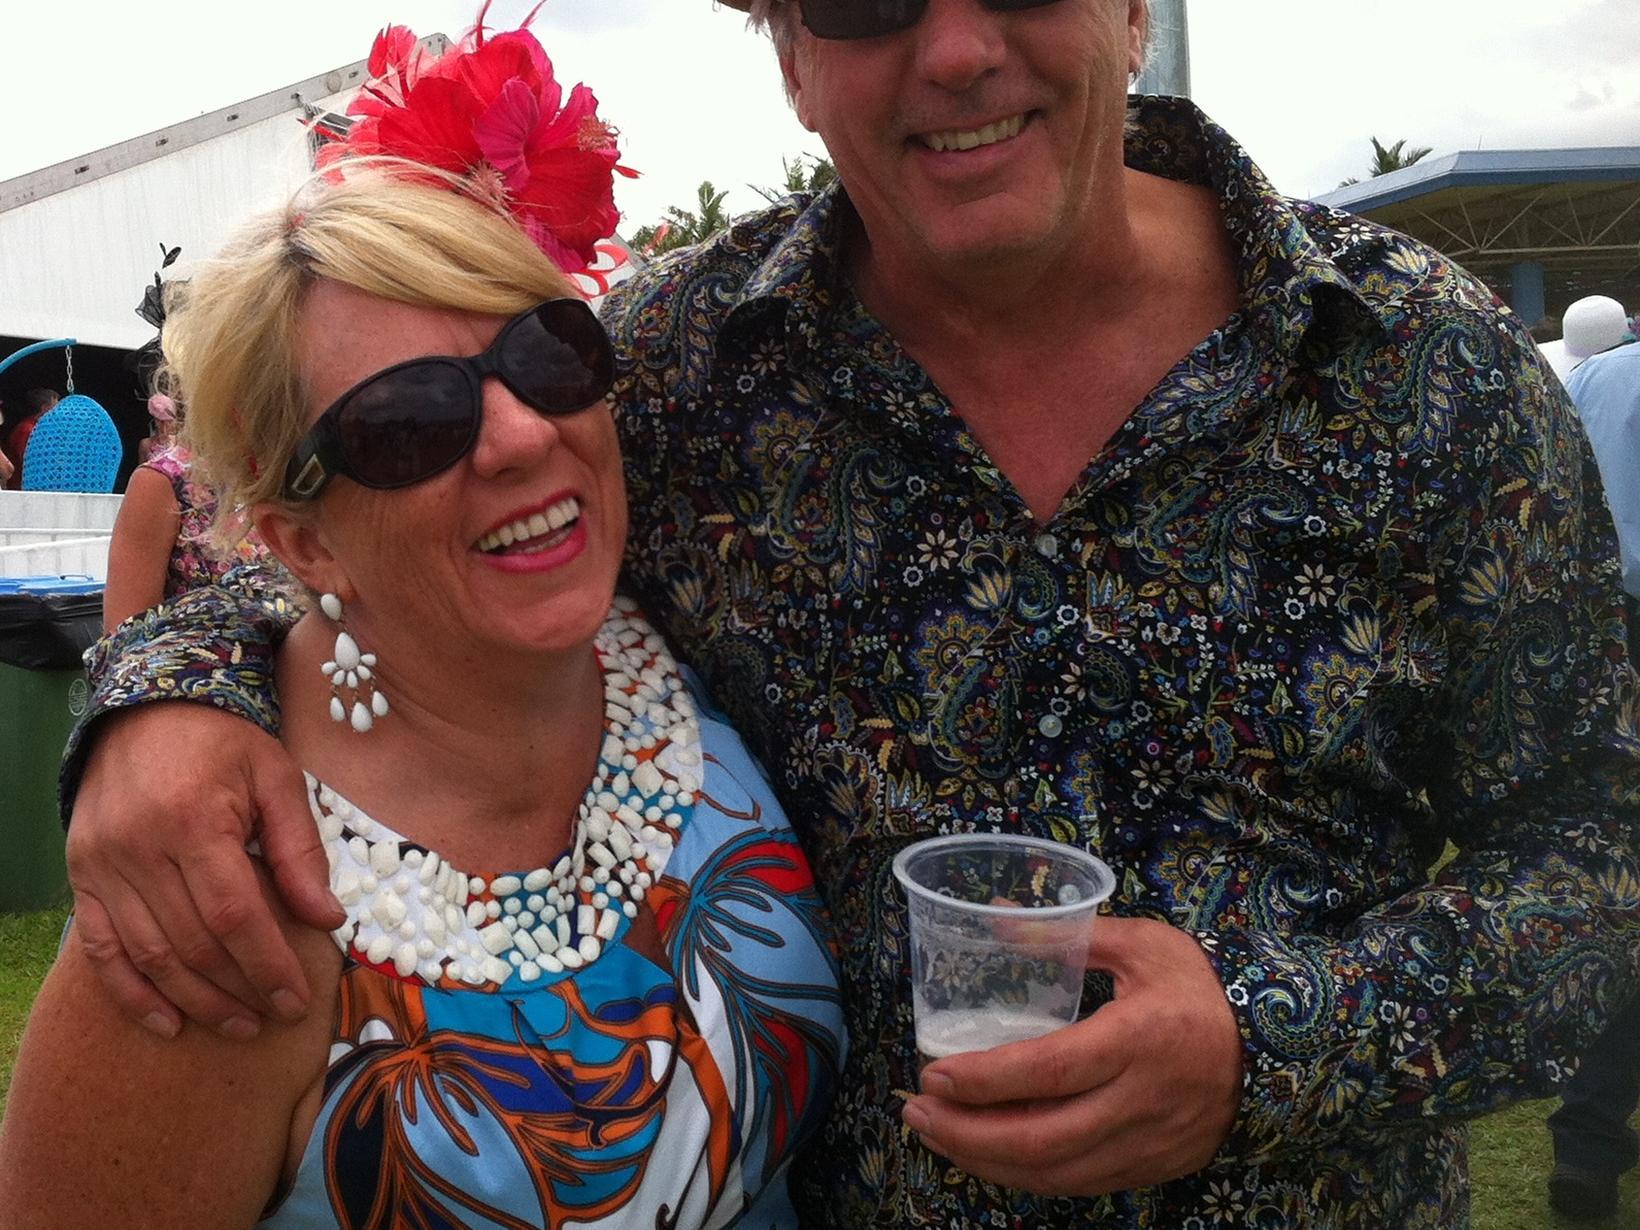 Kathy & Ben from Sunshine Coast, Queensland, Australia